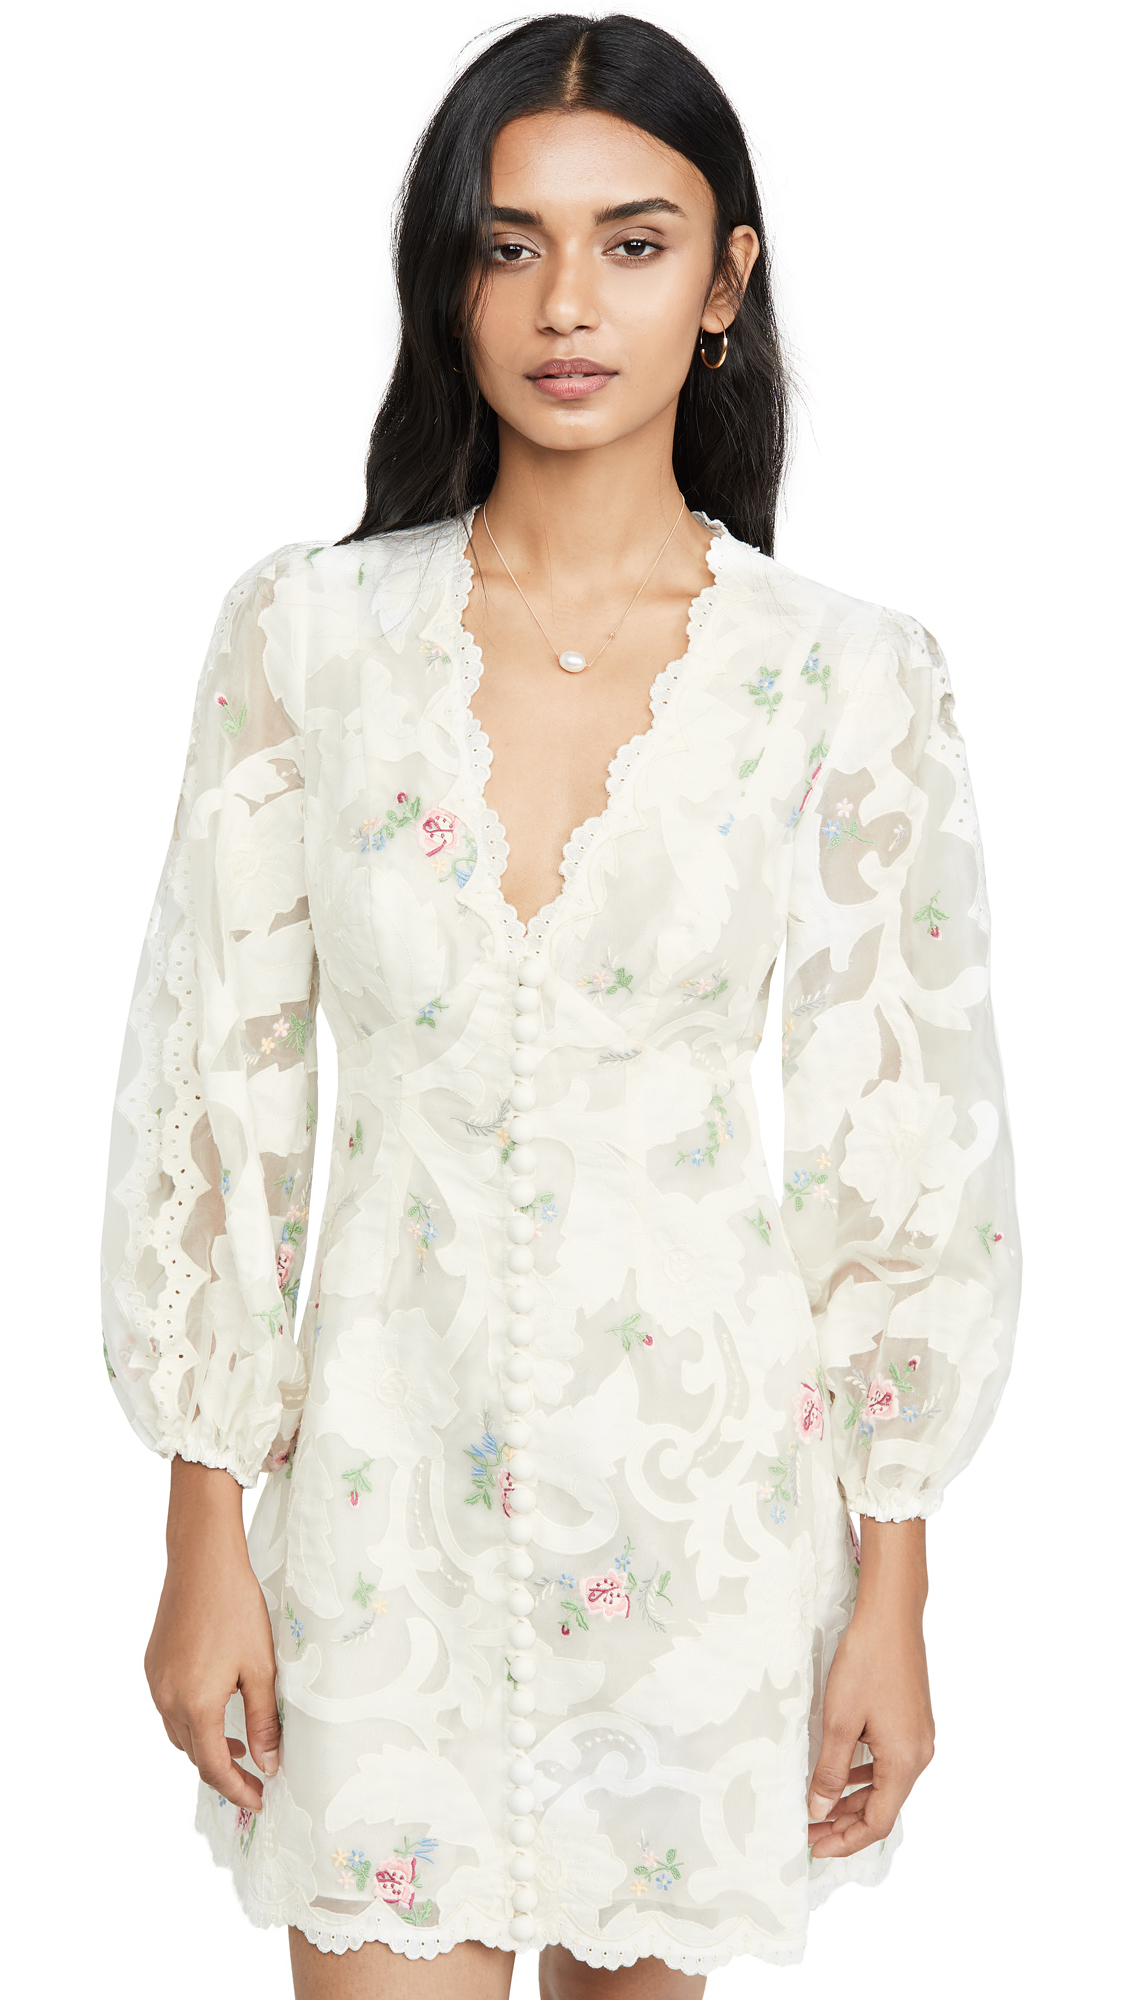 Zimmermann Zinnia Floral-AppliquÉ Organza Mini Dress In Ivory Multi